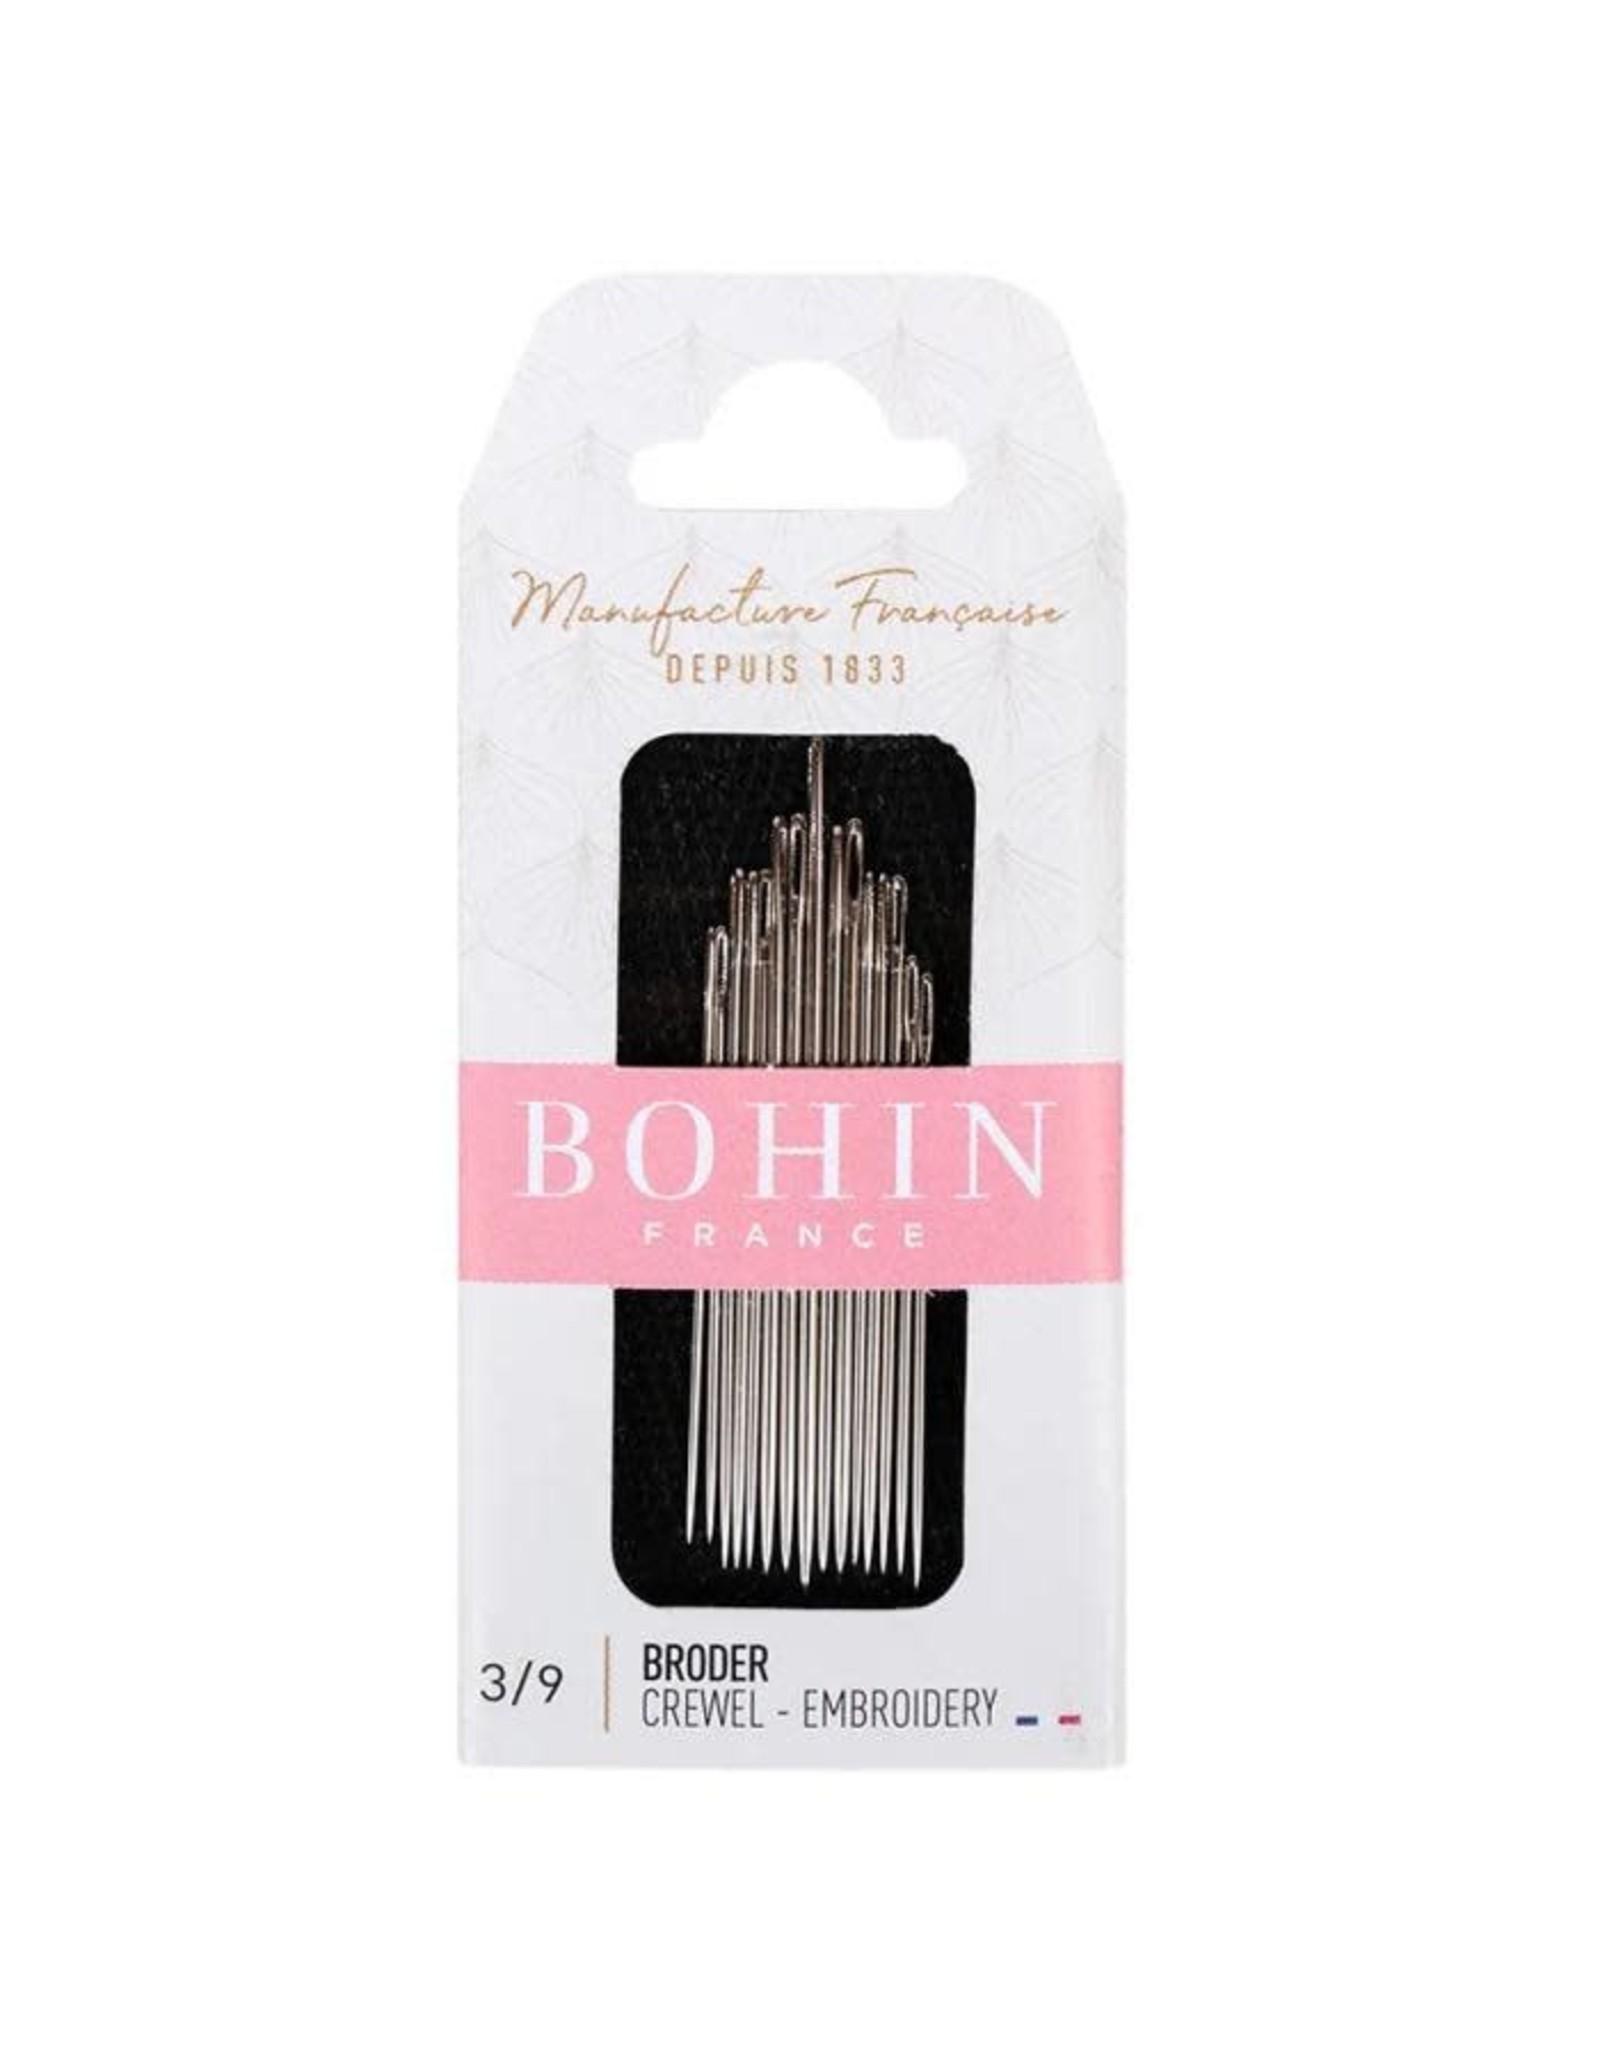 Bohin Crewel-Embroidery Needles, Assorted Sizes 3/9 - 15 ct., Bohin